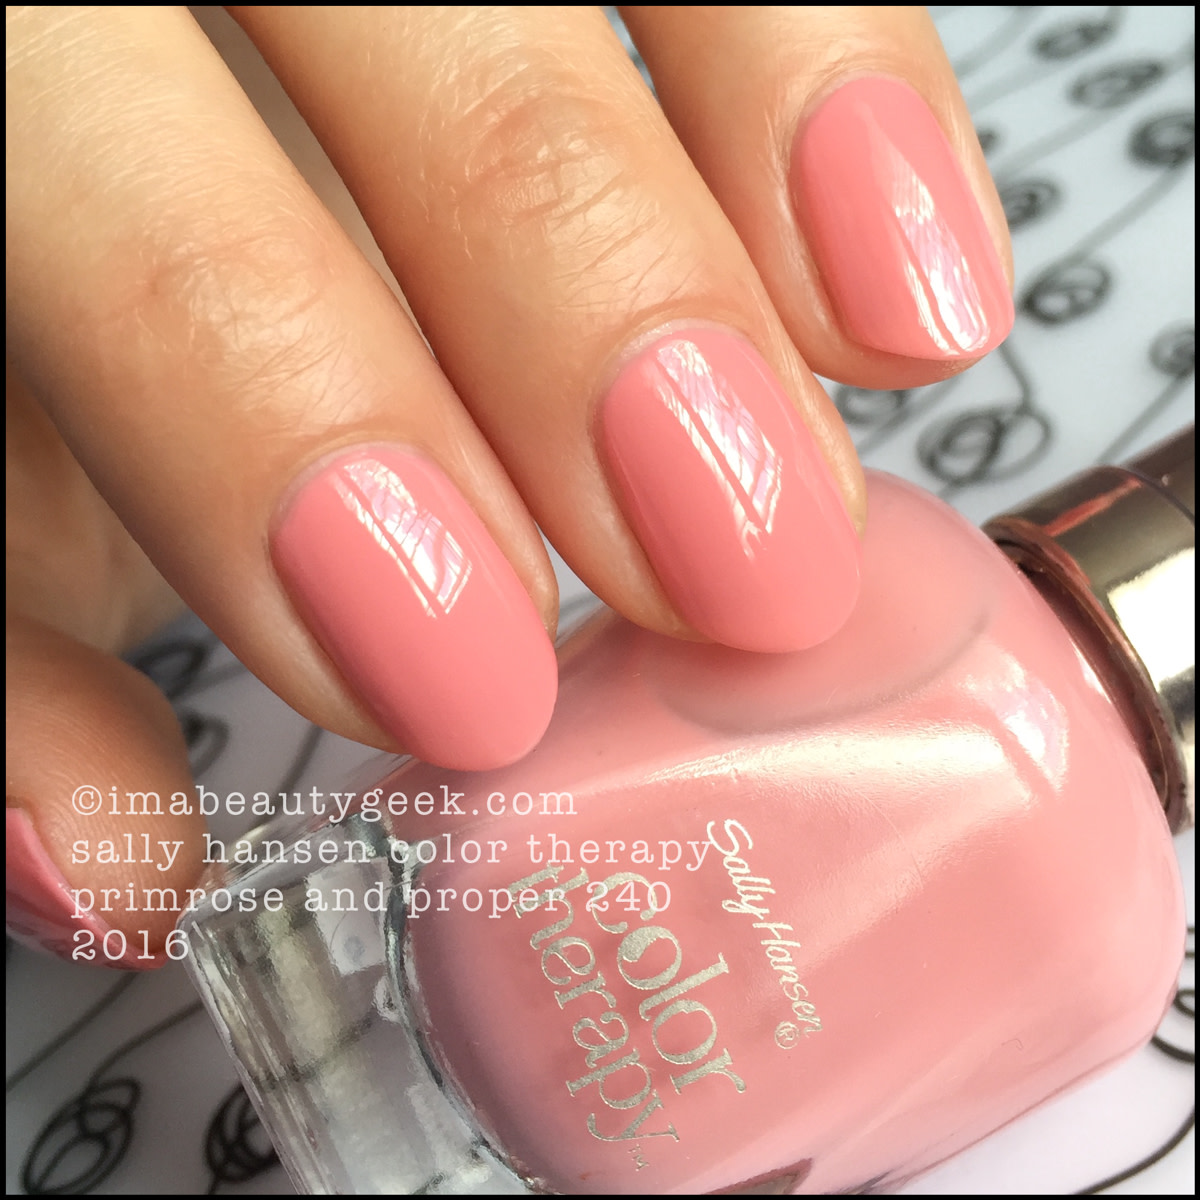 Sally Hansen Color Therapy Primrose and Proper 240_Sally Hansen Color Therapy Nail Review Swatches